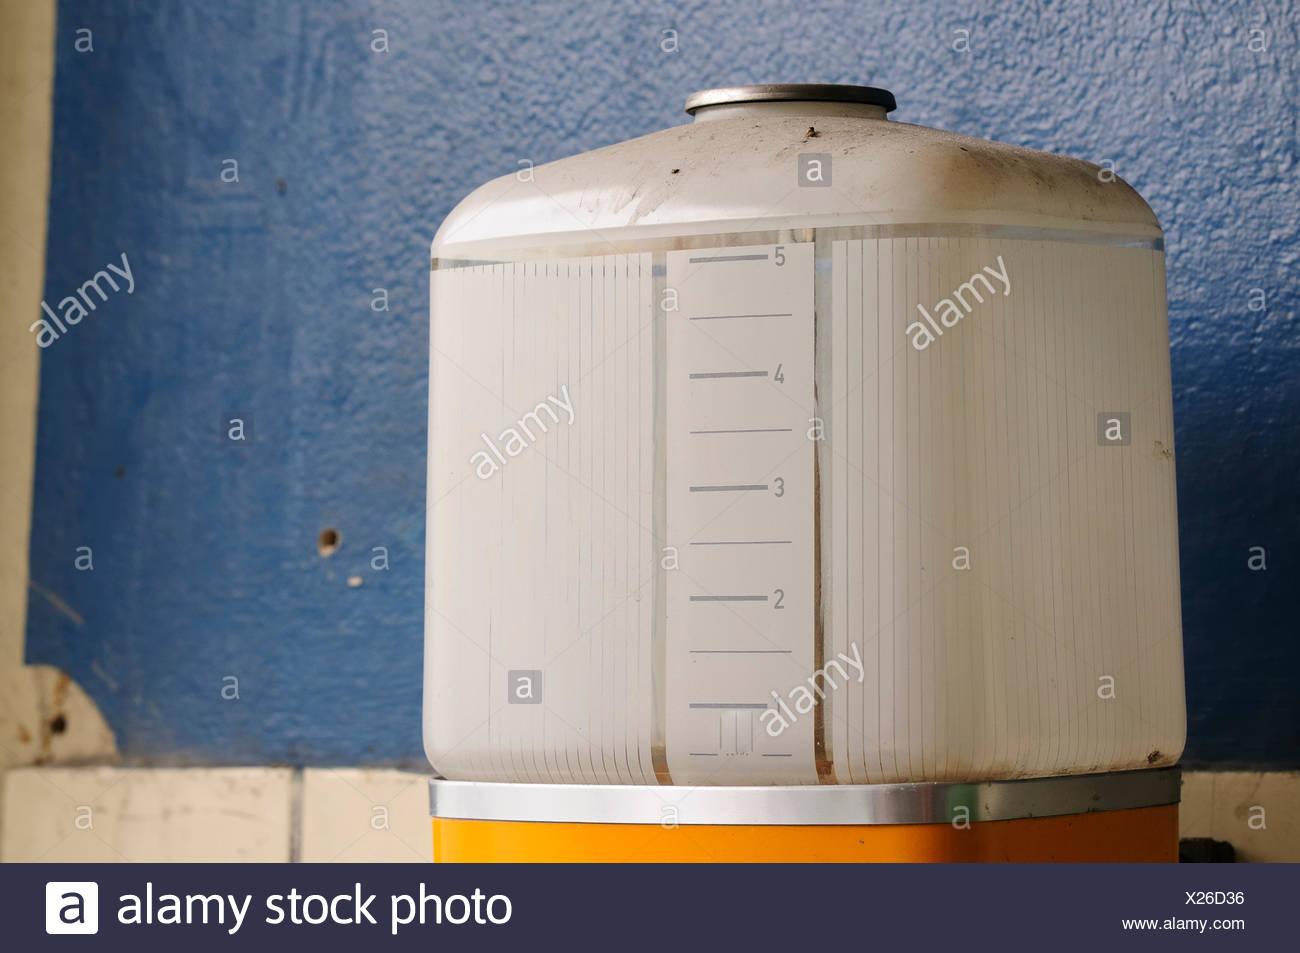 Warmwasserboiler Stock Photos & Warmwasserboiler Stock Images - Alamy